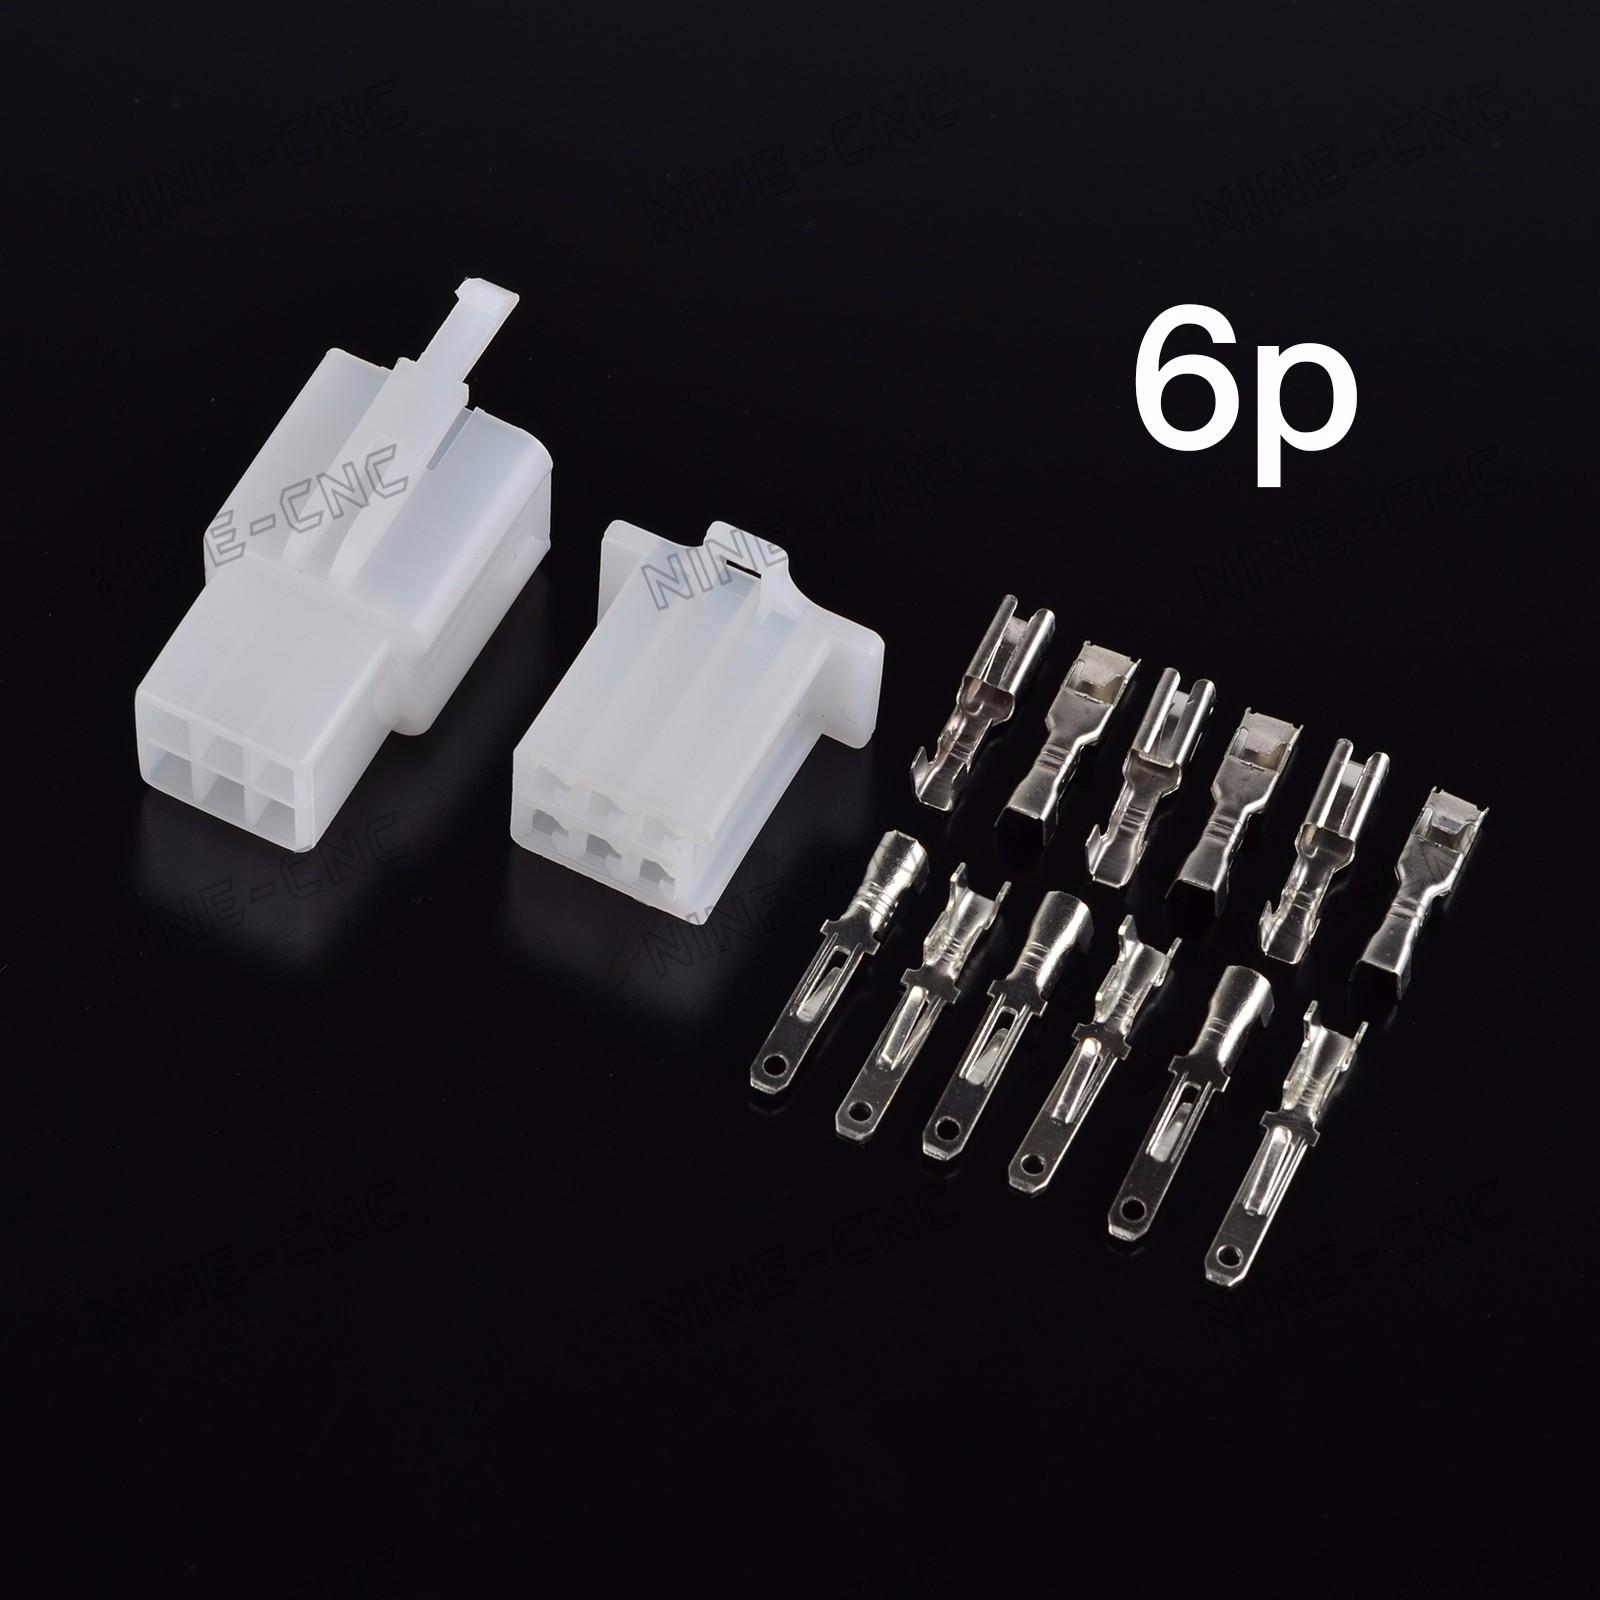 40 X Wire Splice Connector Electrical Crimp Terminal Kit For Ktm Suzuki Connectors Kawasaki